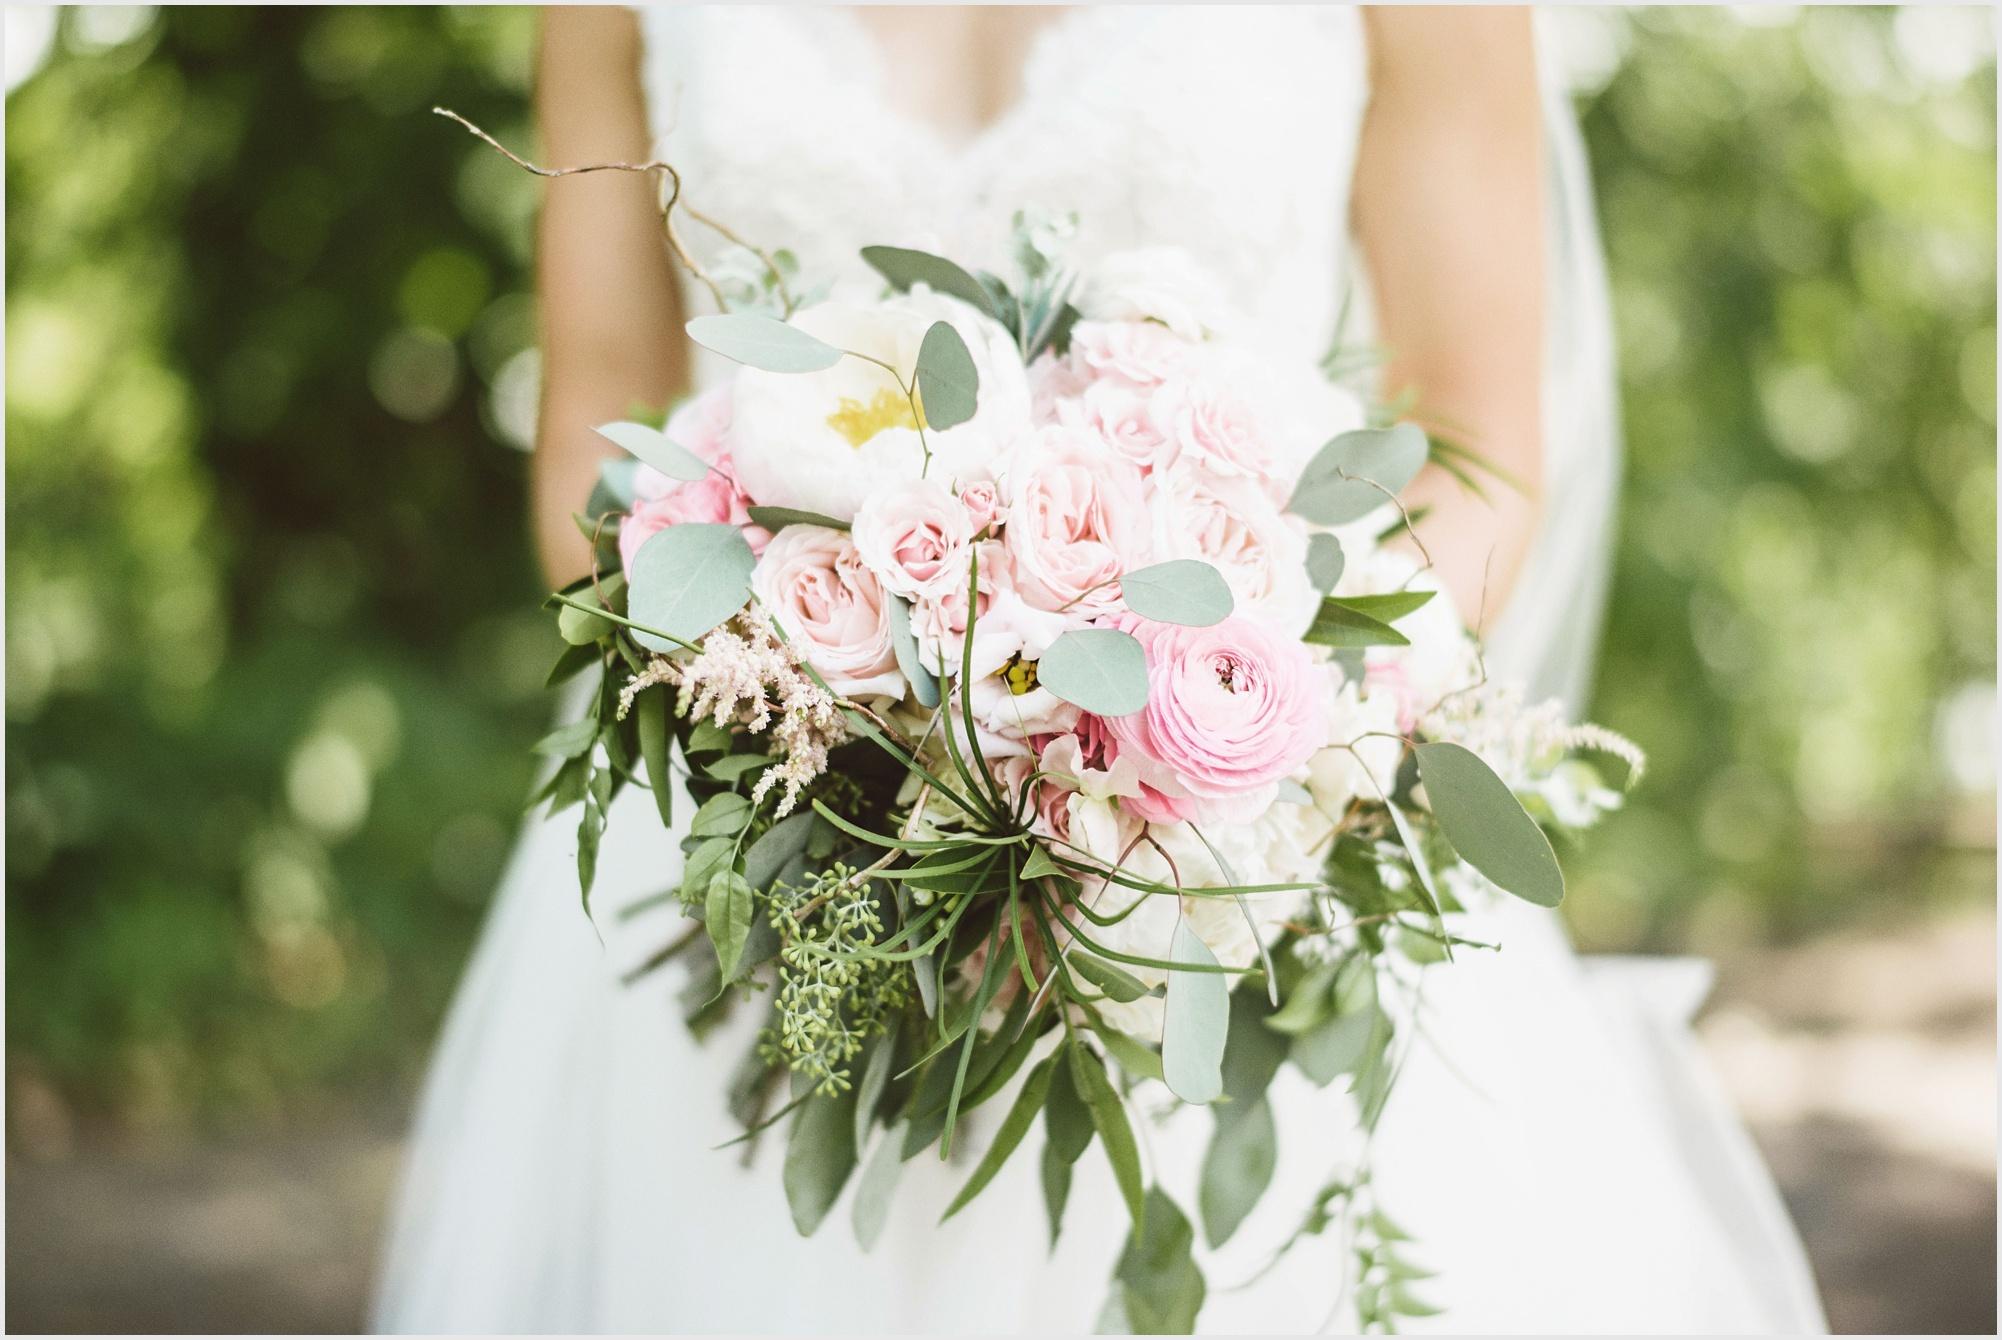 maura_david_james_j_hill_wedding_lucas_botz_photography_024.jpg